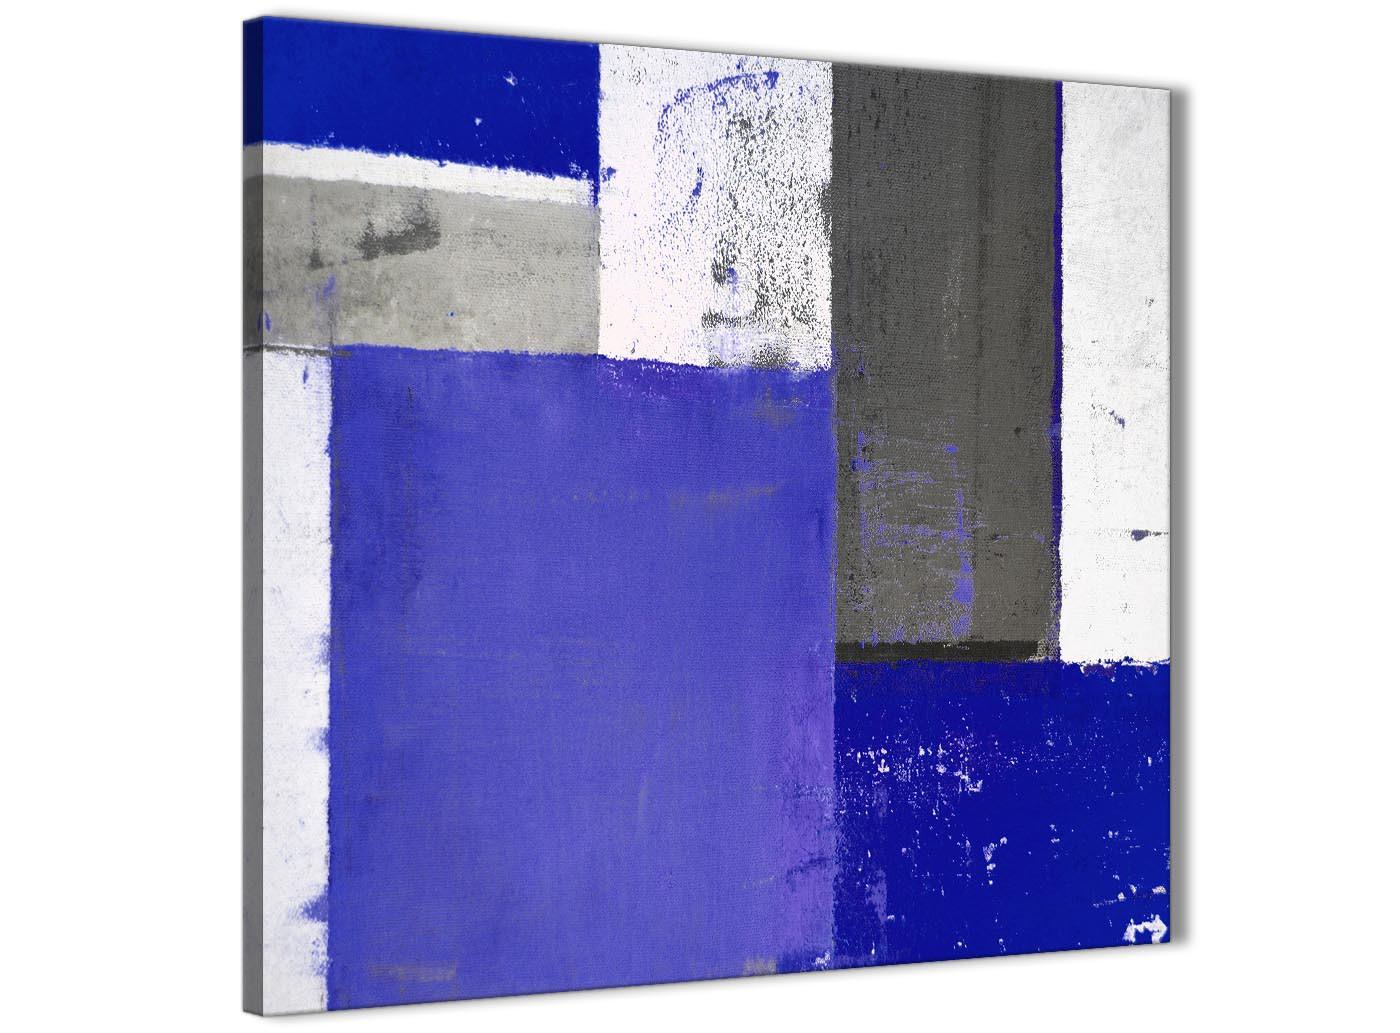 Indigo Navy Blue Abstract Painting Canvas Wall Art Print